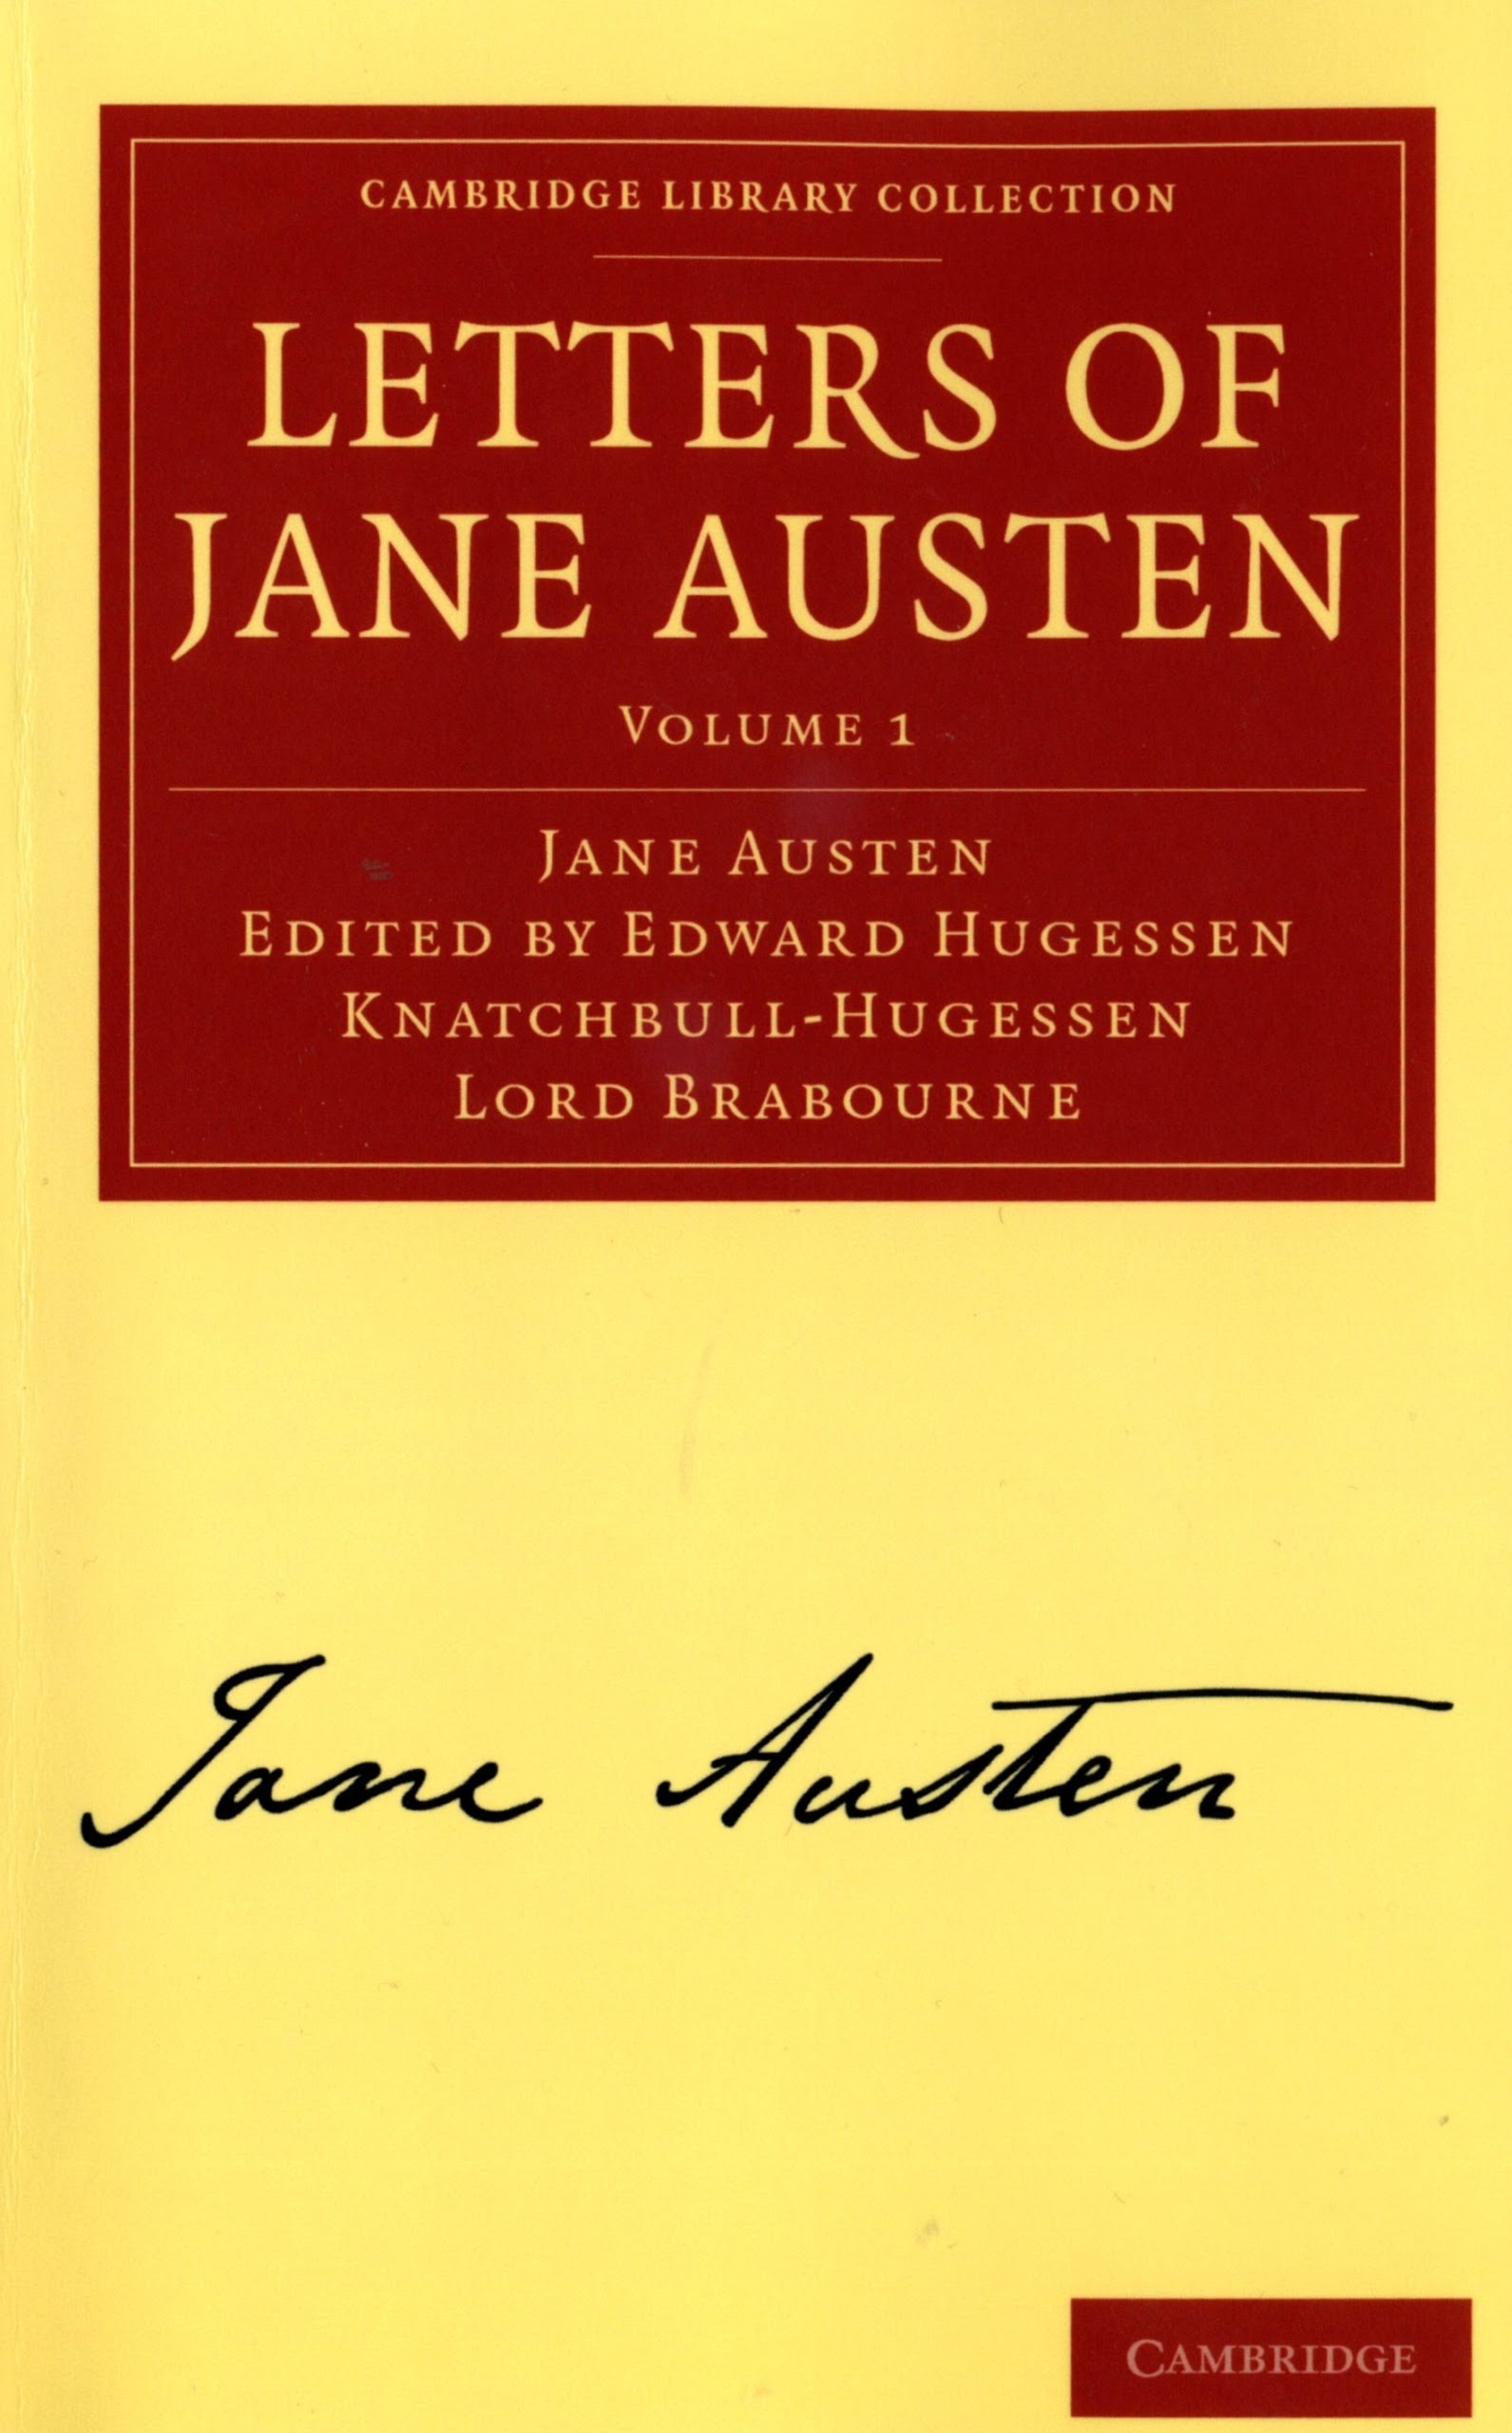 The Letters of Jane Austen.jpg